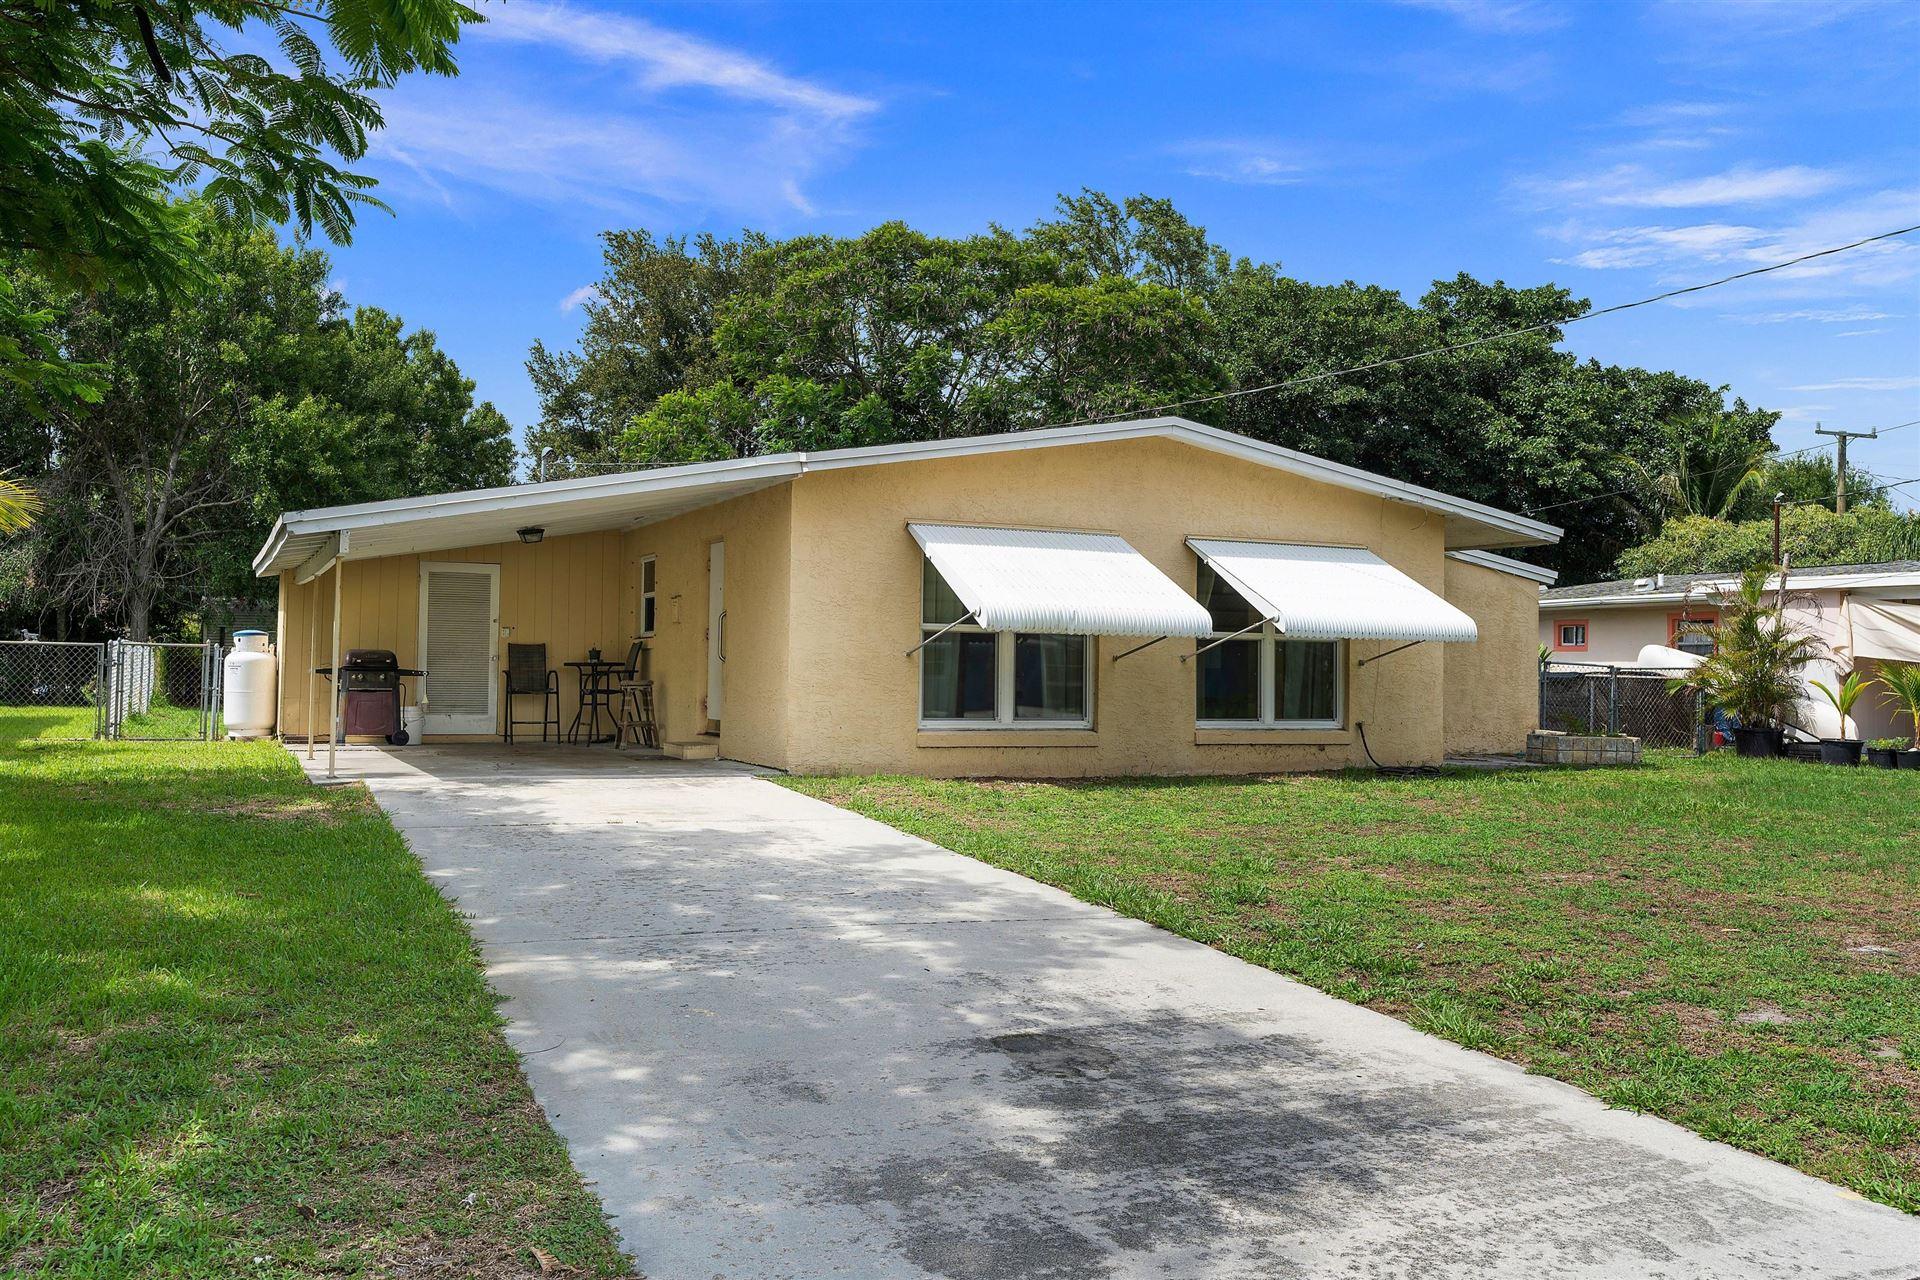 204 Maple Avenue, Fort Pierce, FL 34982 - MLS#: RX-10730339